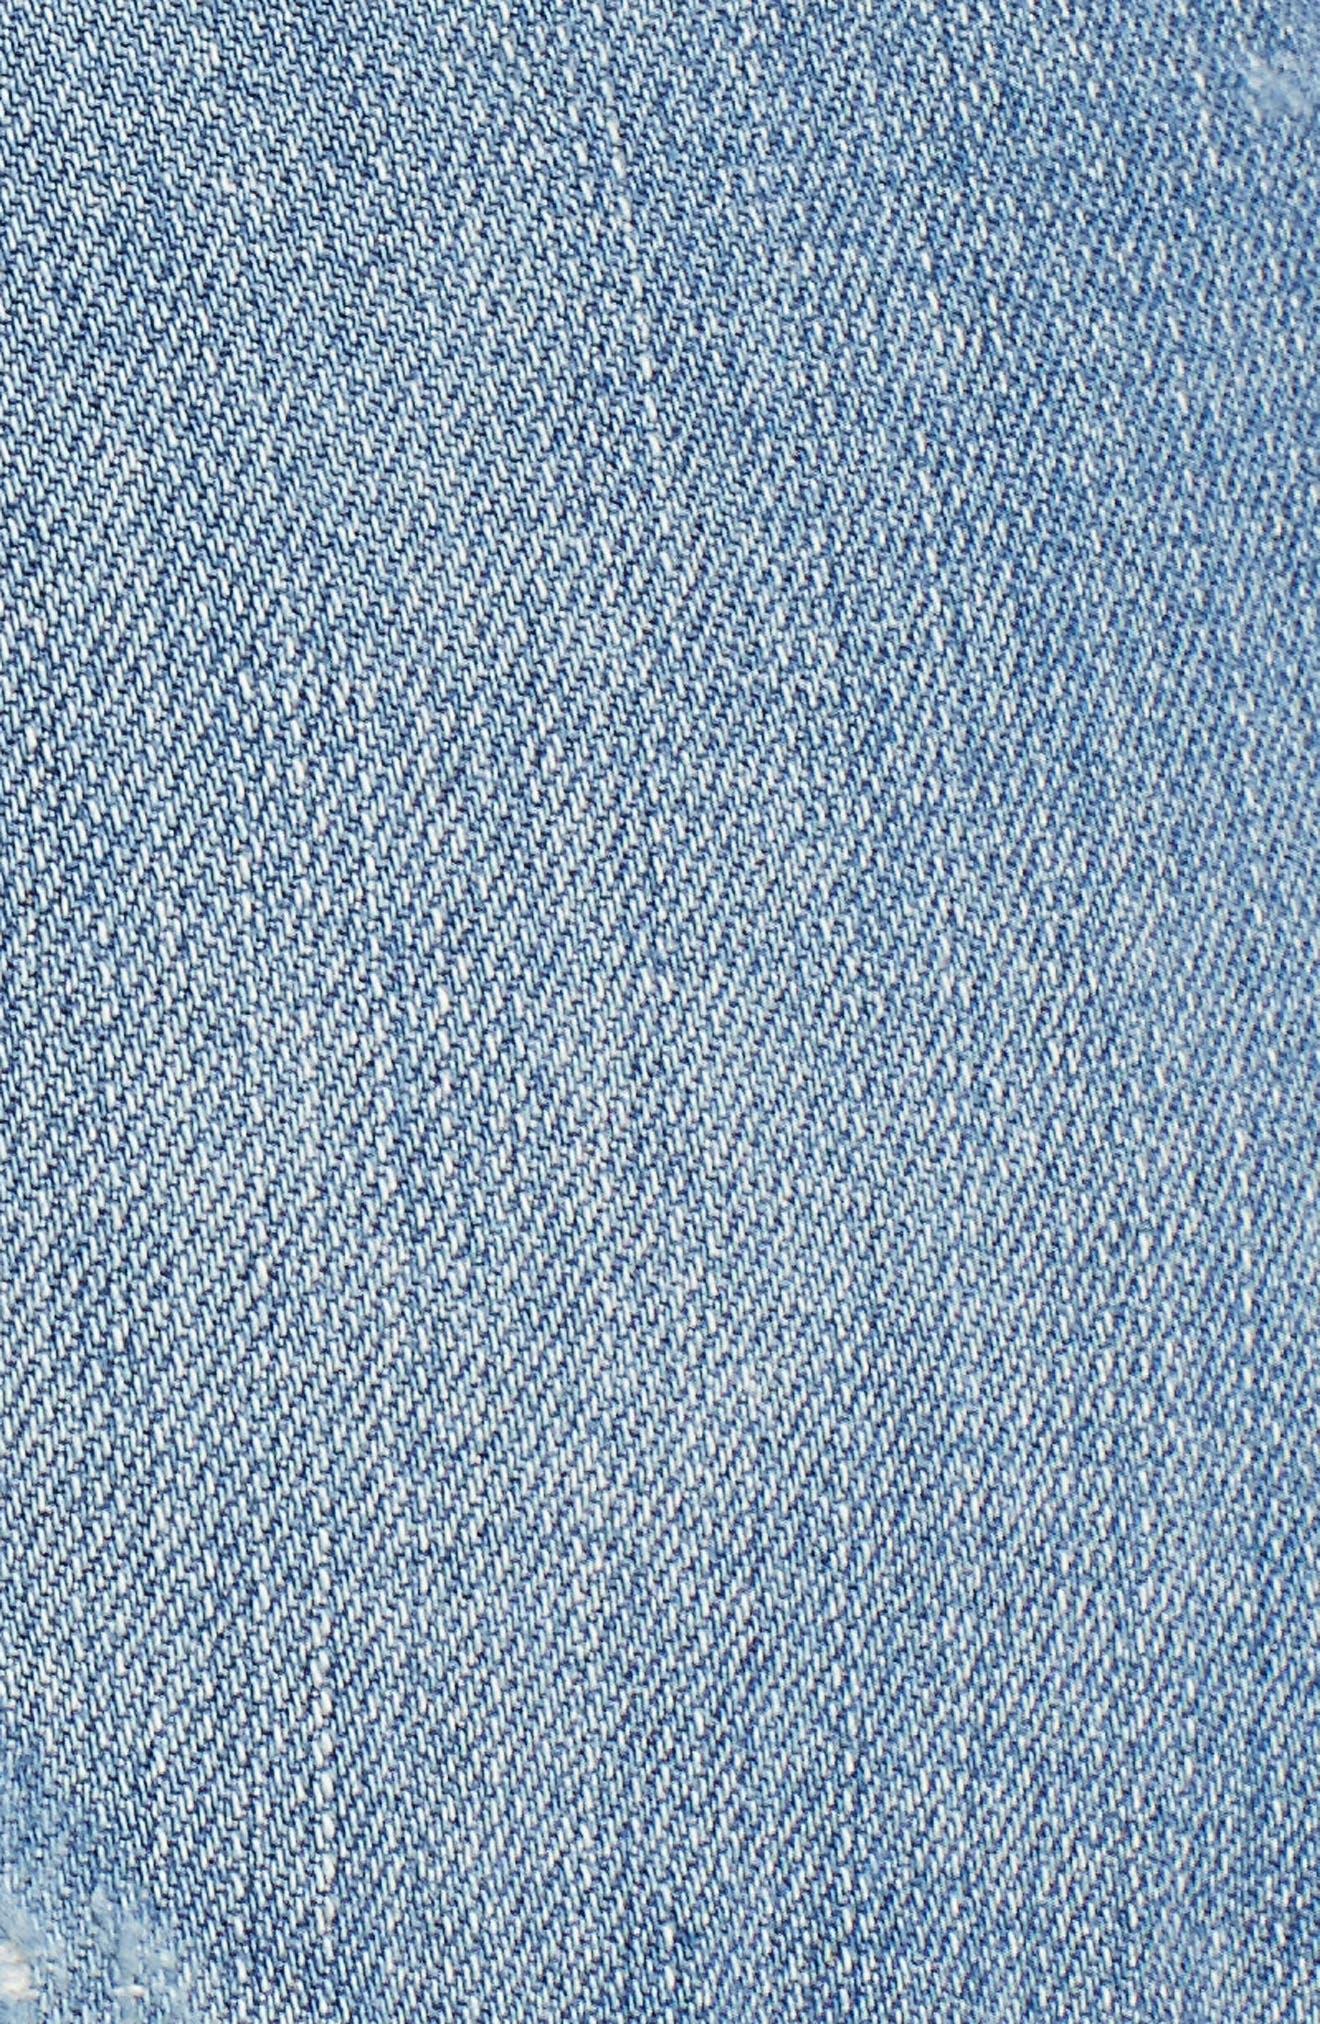 Emmitt High Waist Cutoff Denim Shorts,                             Alternate thumbnail 6, color,                             Janis Destructed